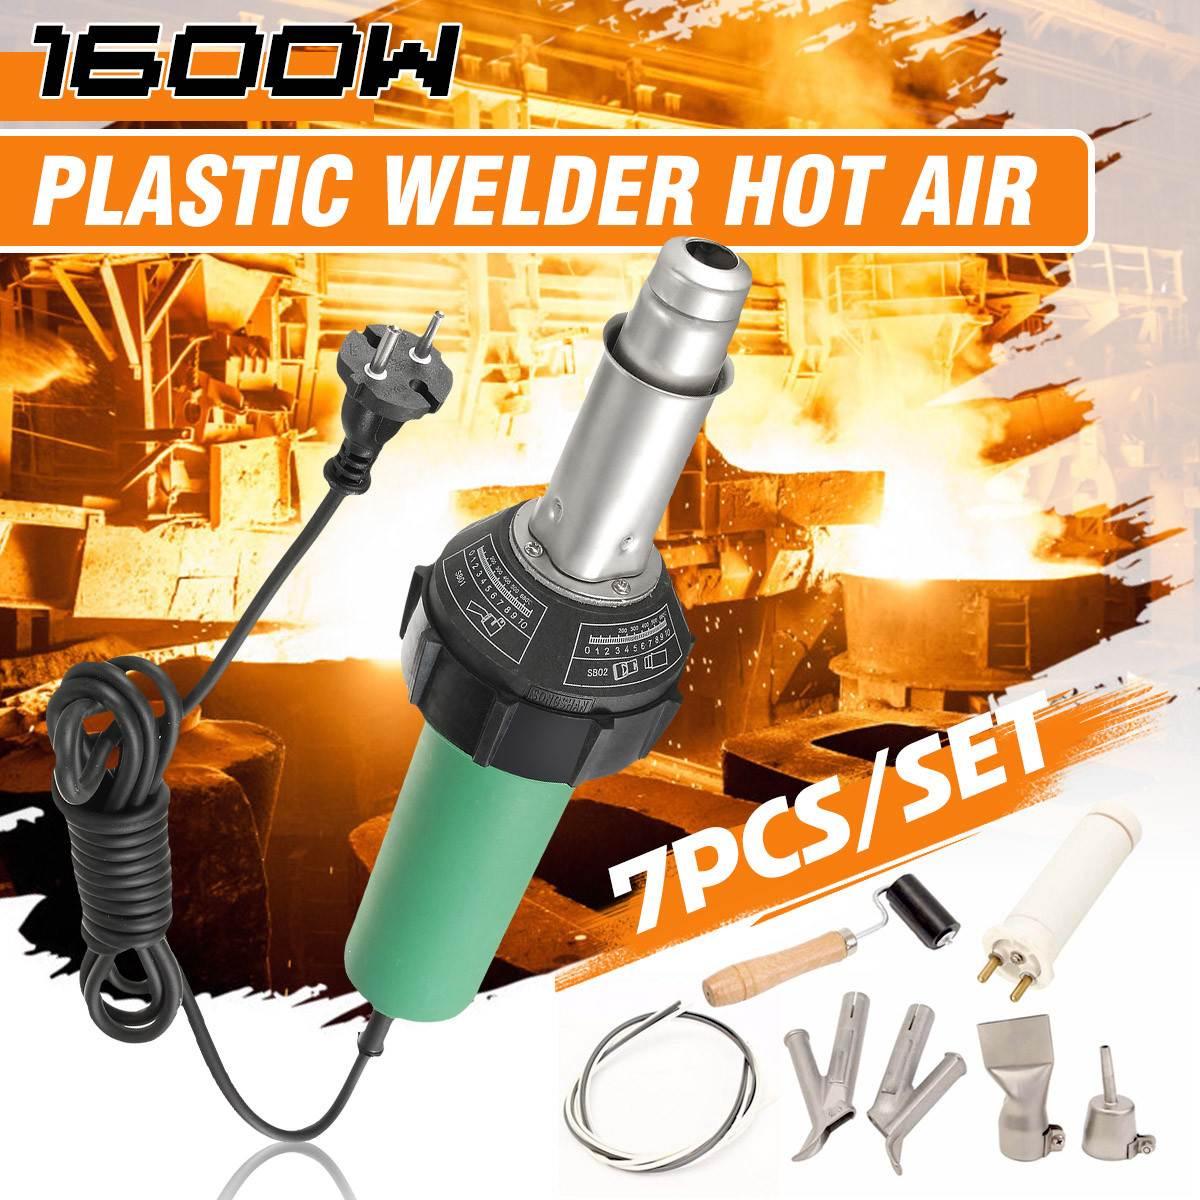 7PCS/Set AC 220V 1600W 50/60Hz Hot Air Torch Plastic Welding-Gun For Welder + Nozzle Welding+Heating Lement